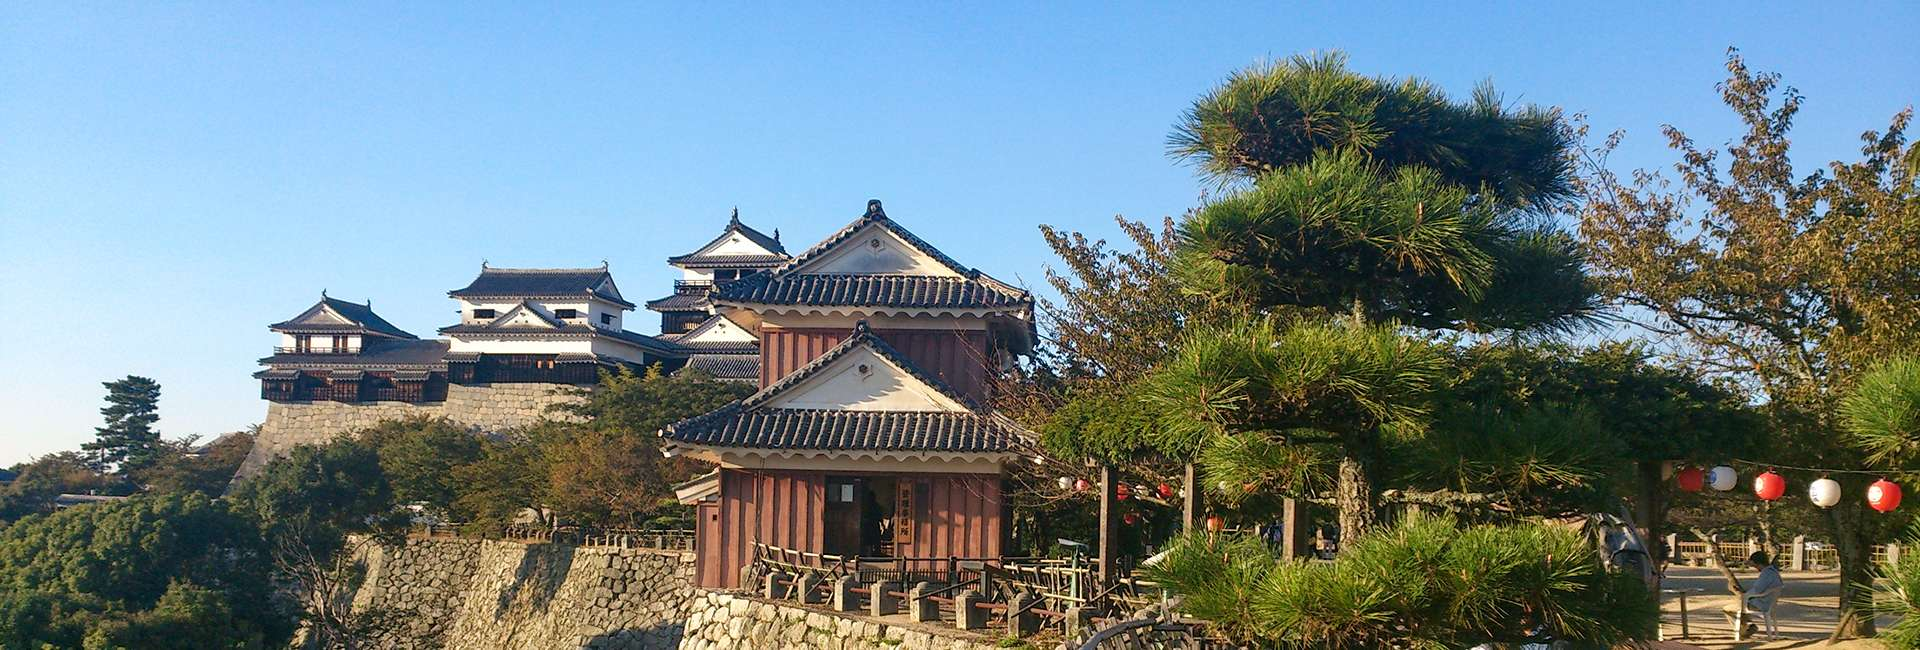 château de Matsuyama au Japon